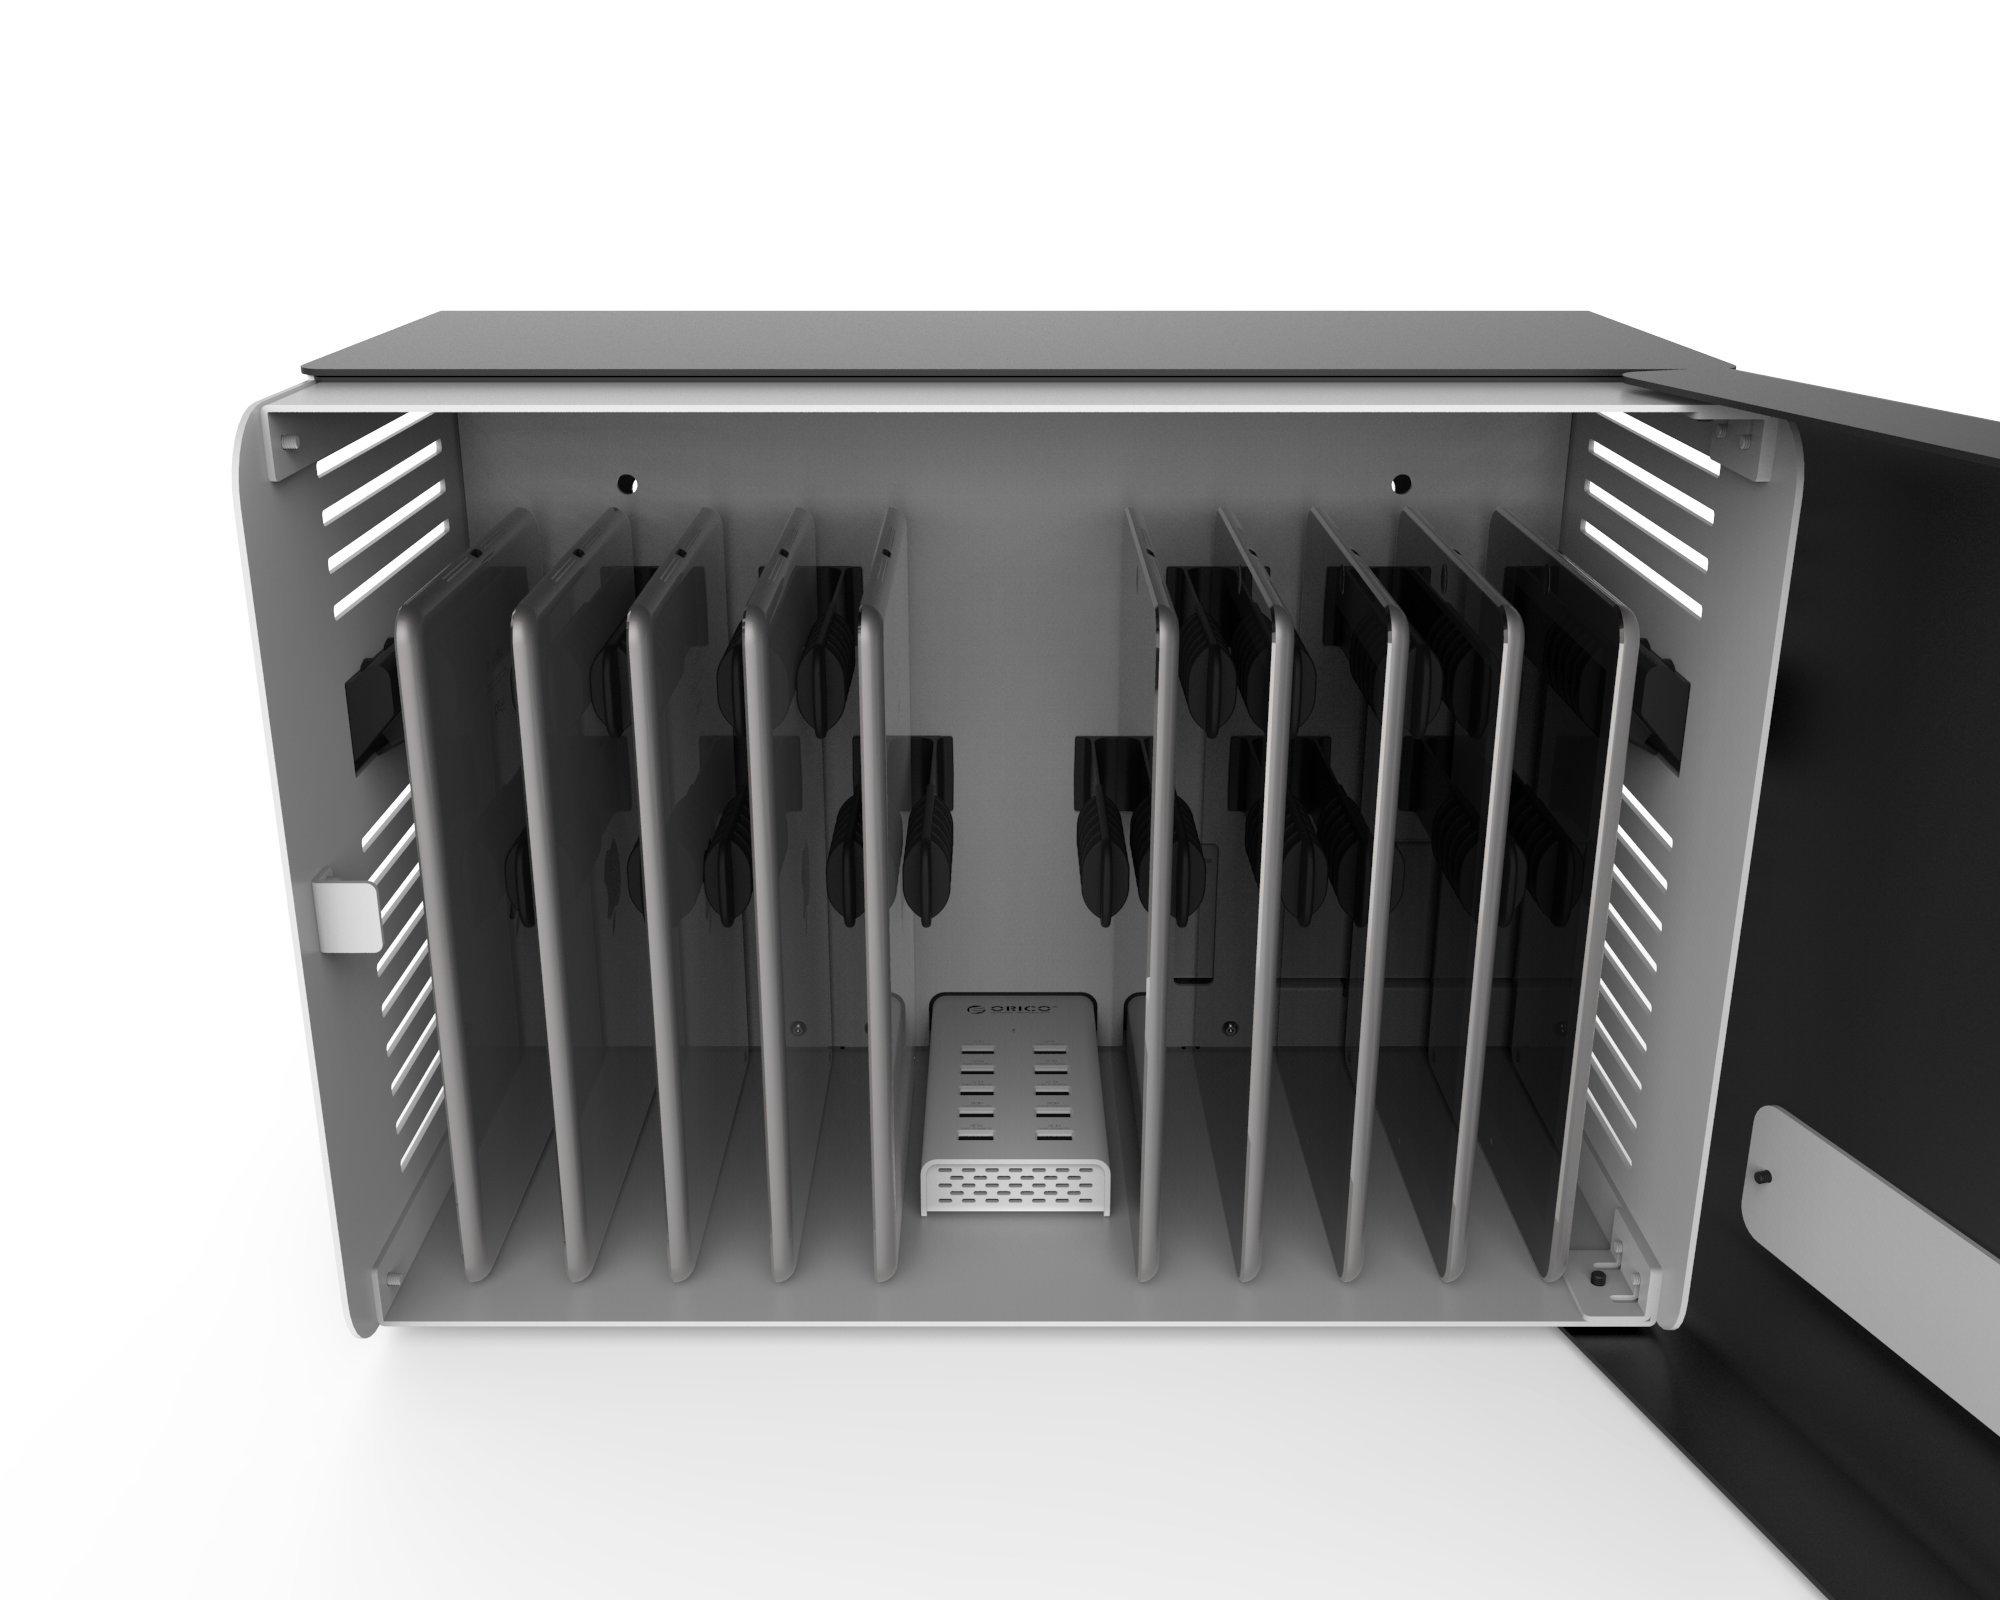 Maclocks CHRGBOX10B Charge Box 10 Tablet Charging Locker with USB Hub for iPhone/iPad/Samsung/Nexus (Black)